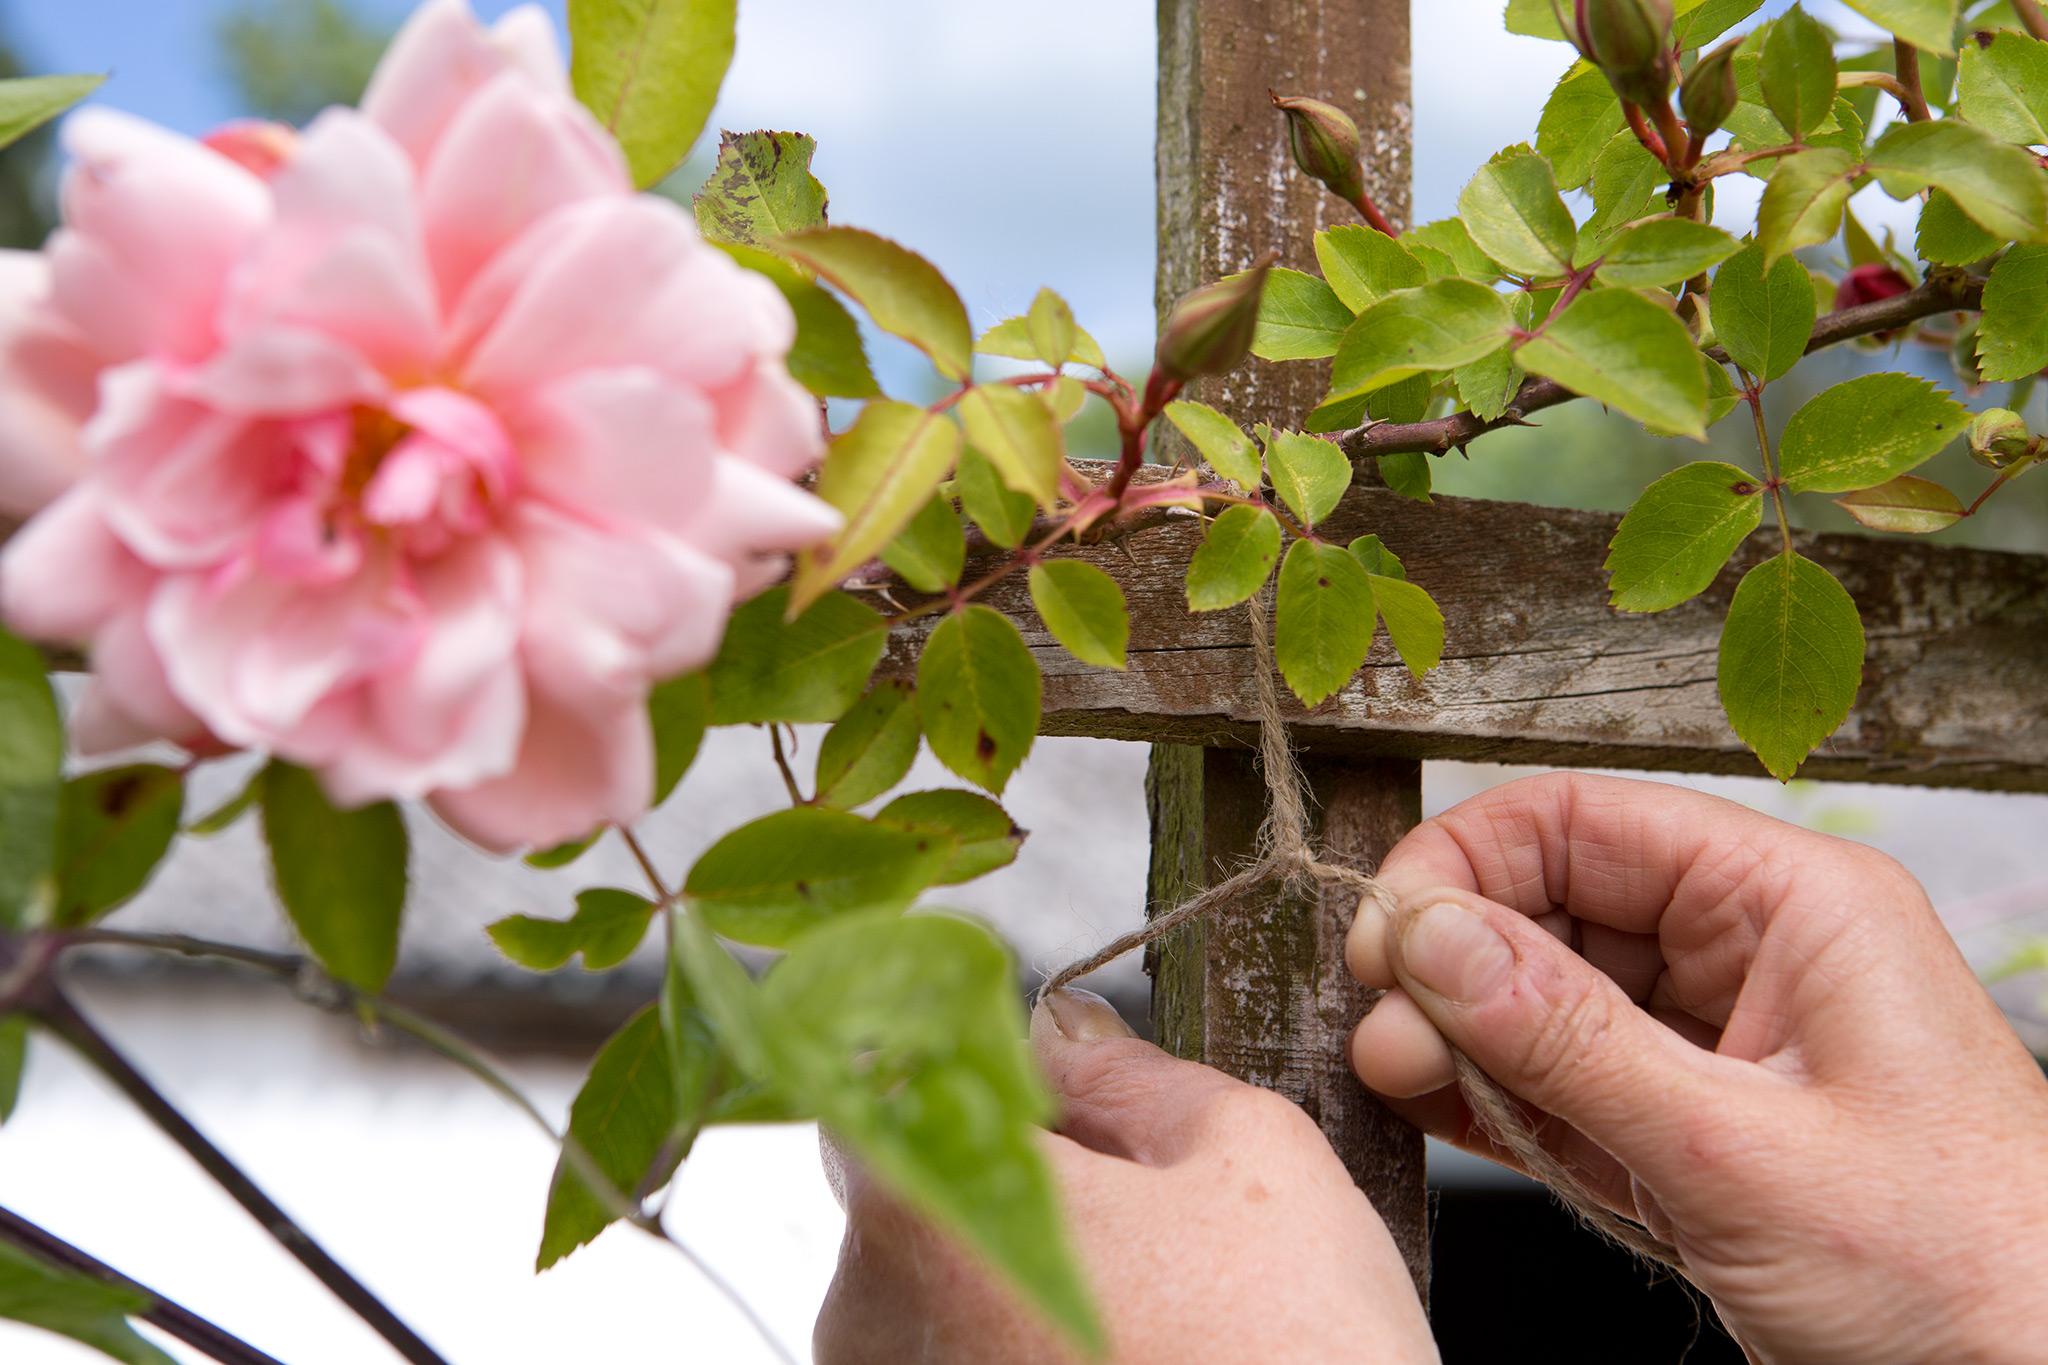 tying-in-a-rose-stem-2